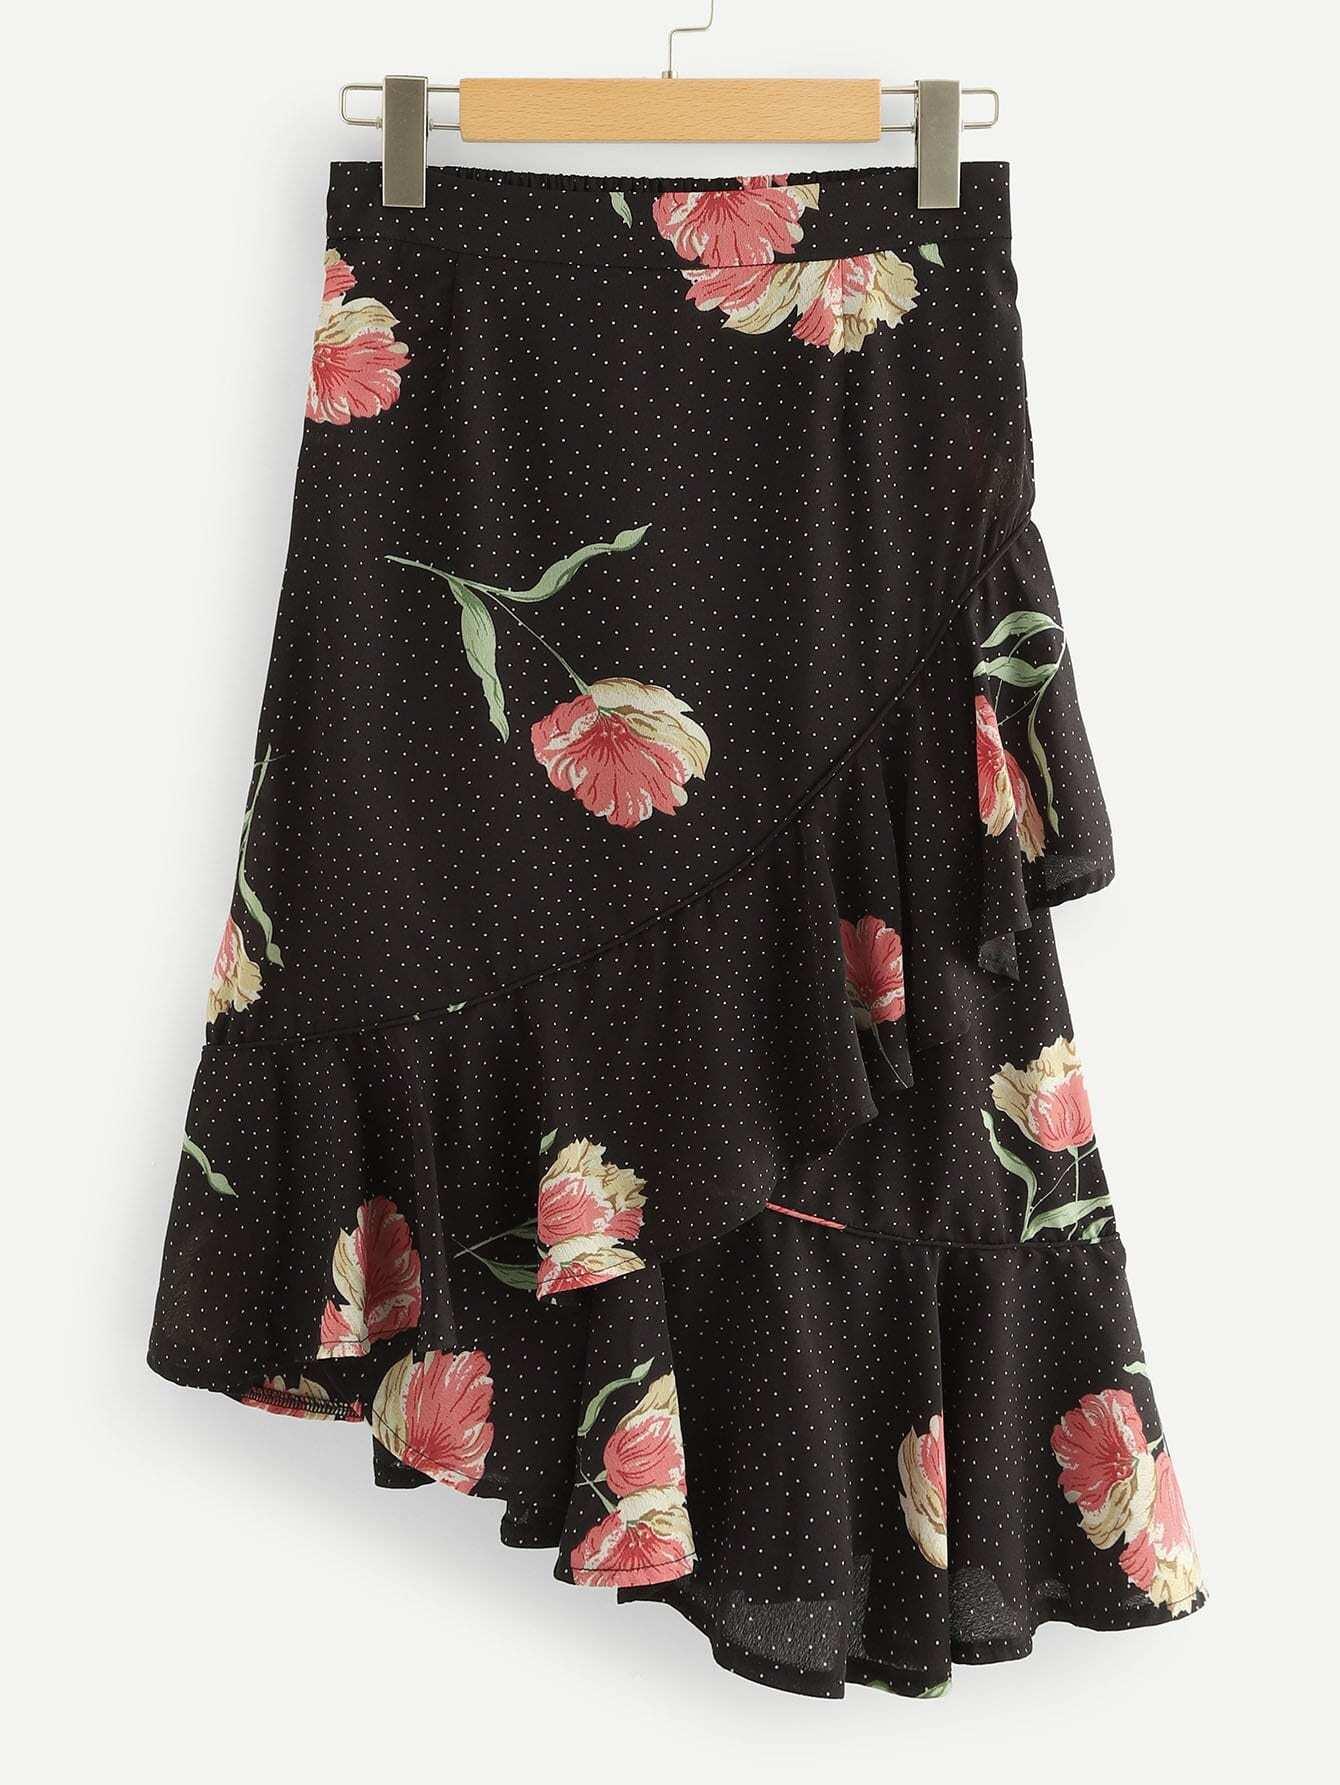 Floral Print Ruffle Trim Asymmetrical Hem Skirt asymmetrical ruffle trim floral skirt